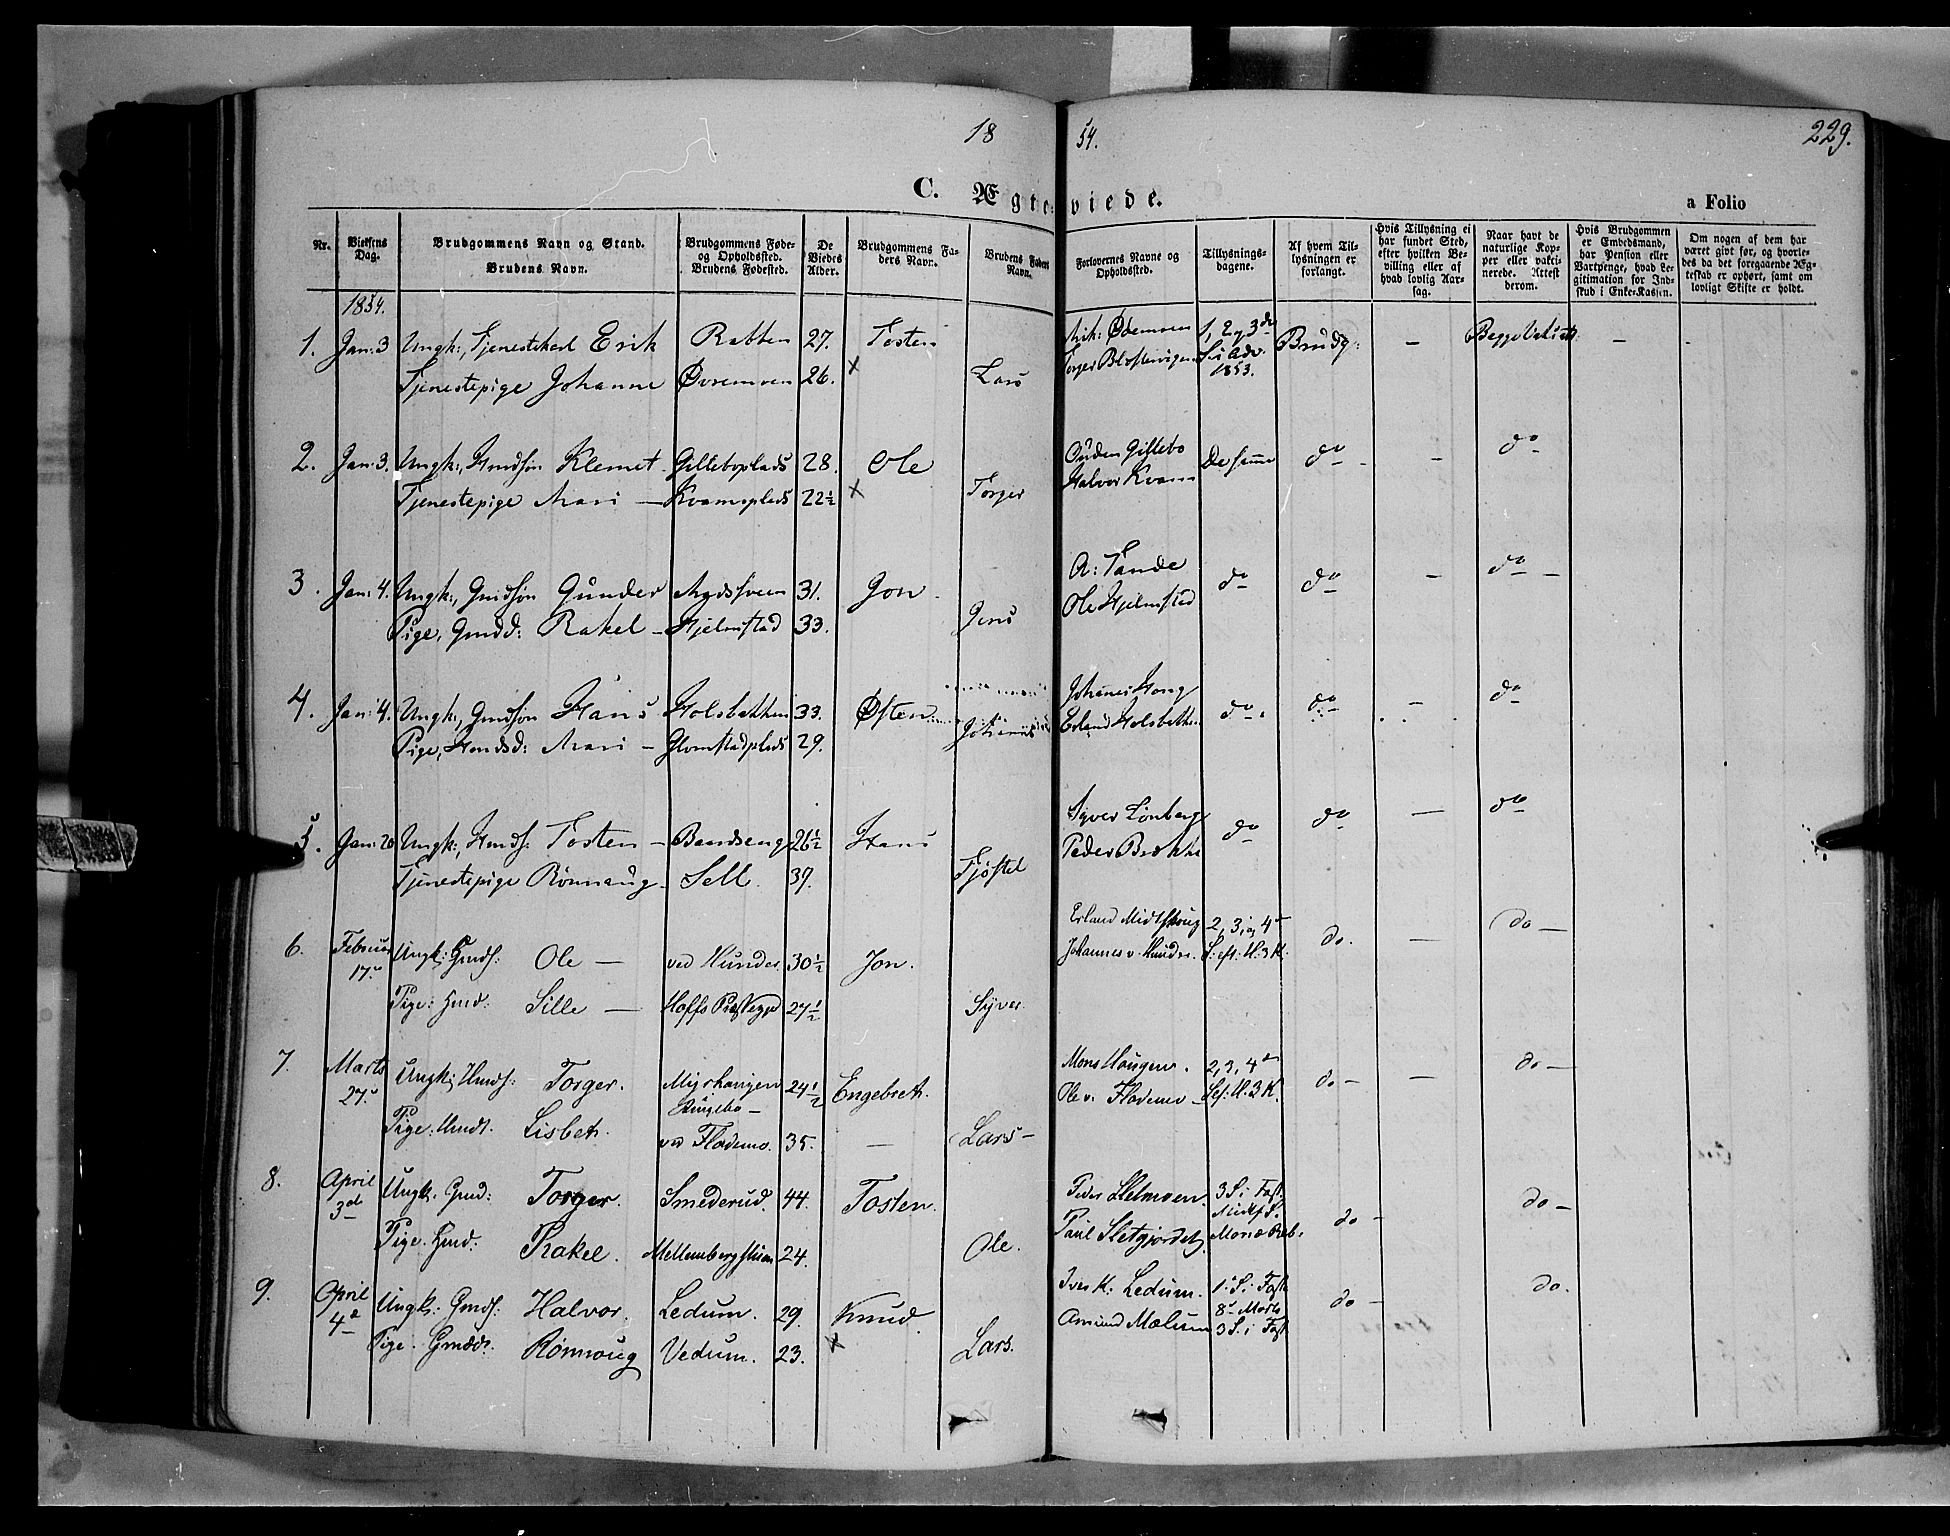 SAH, Øyer prestekontor, Ministerialbok nr. 5, 1842-1857, s. 229